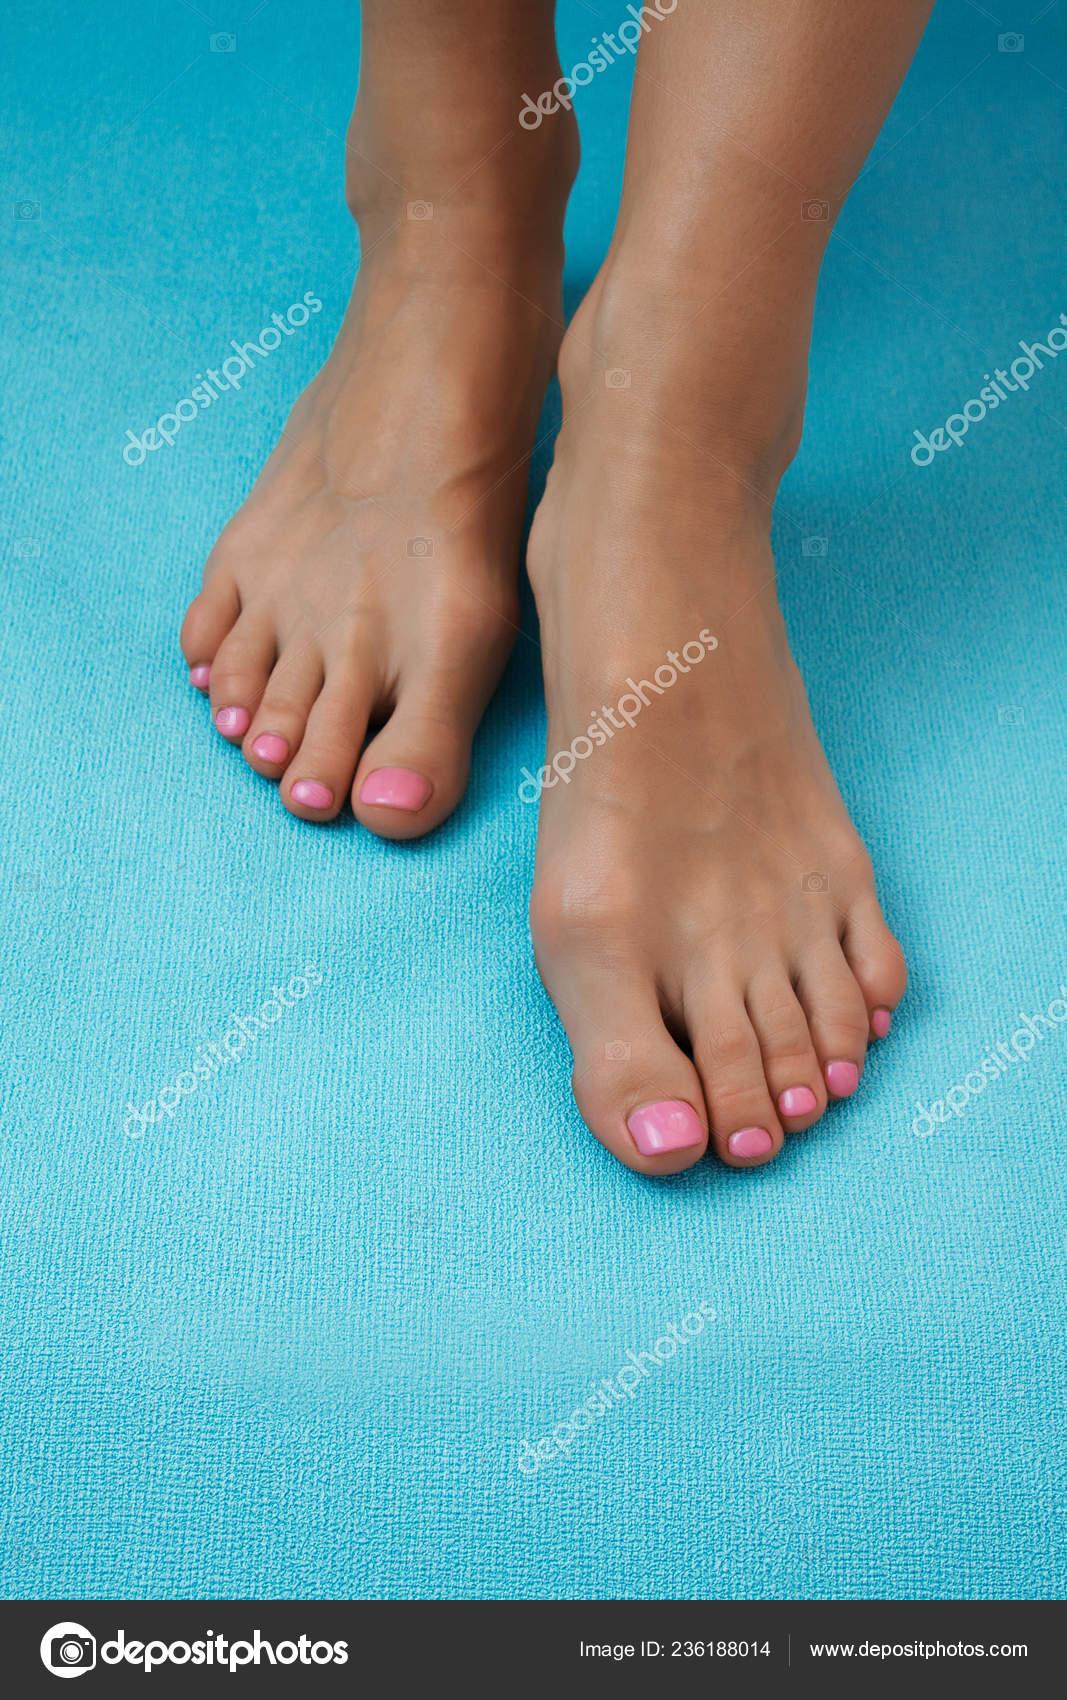 Mlada Perfektni Udrzovana Zena Nohy Pastelove Modre Pozadi Pece Nehty Stock Fotografie C Violanda 236188014